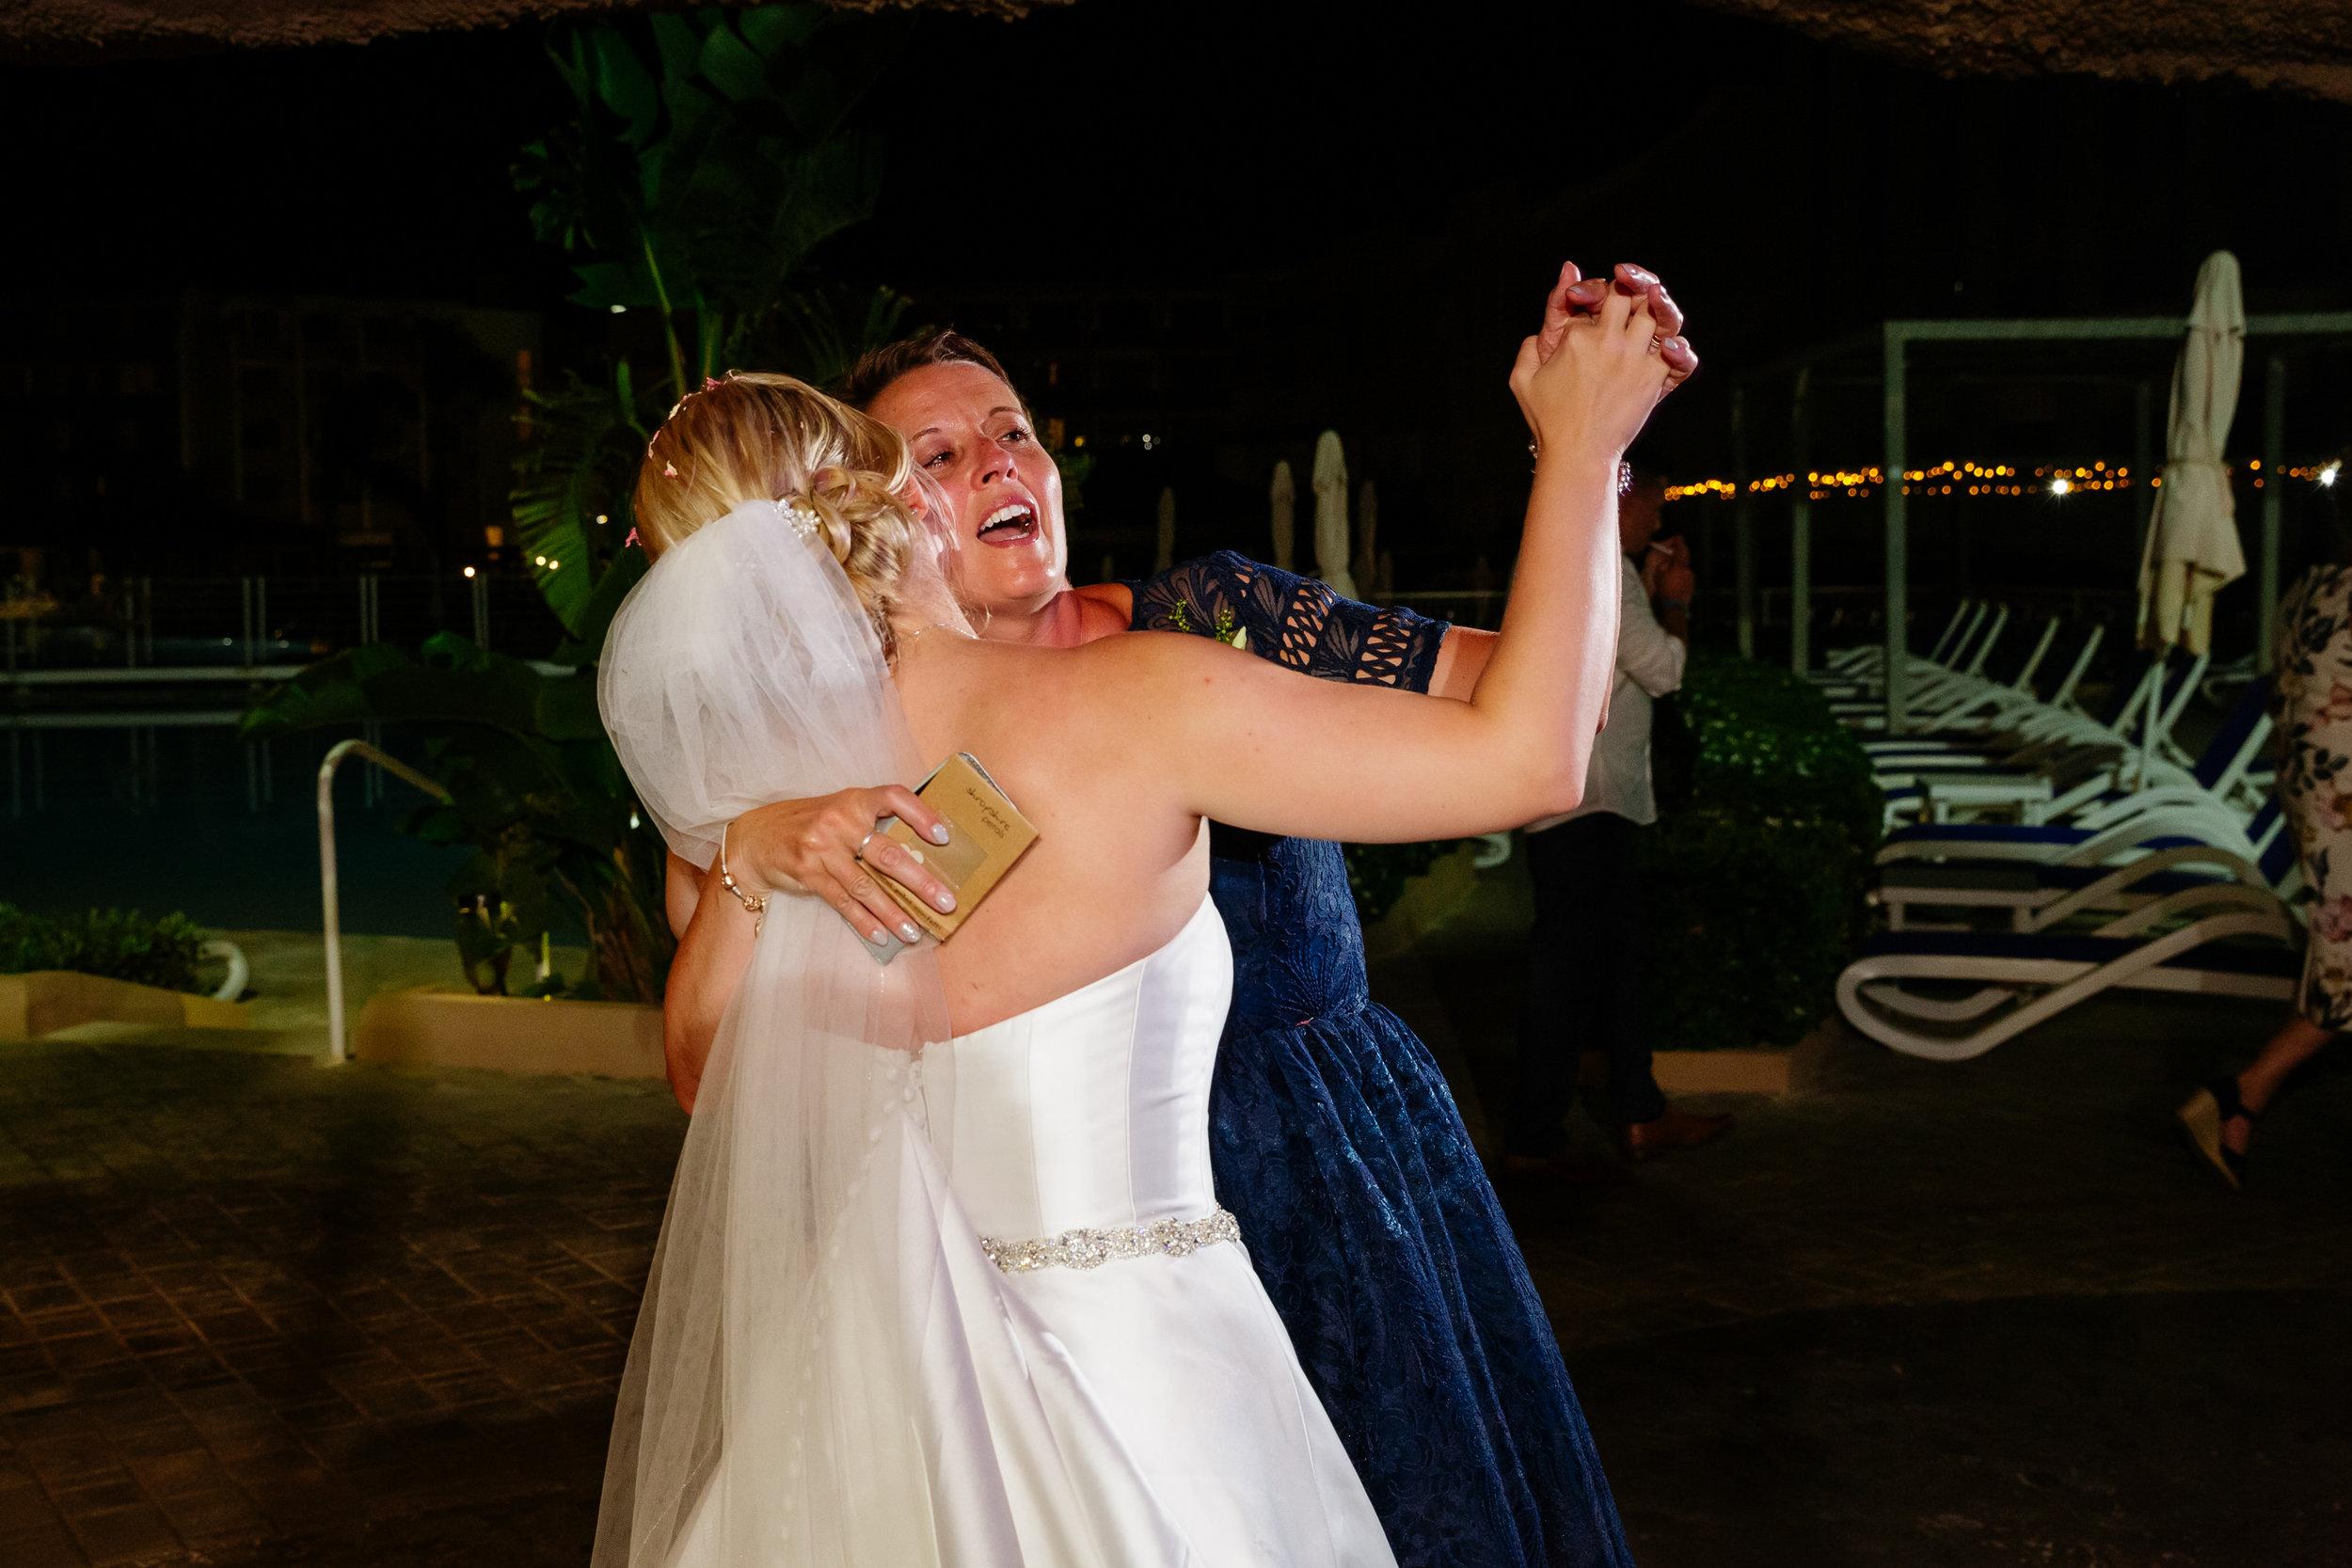 Malta_wedding_photography-107.jpg